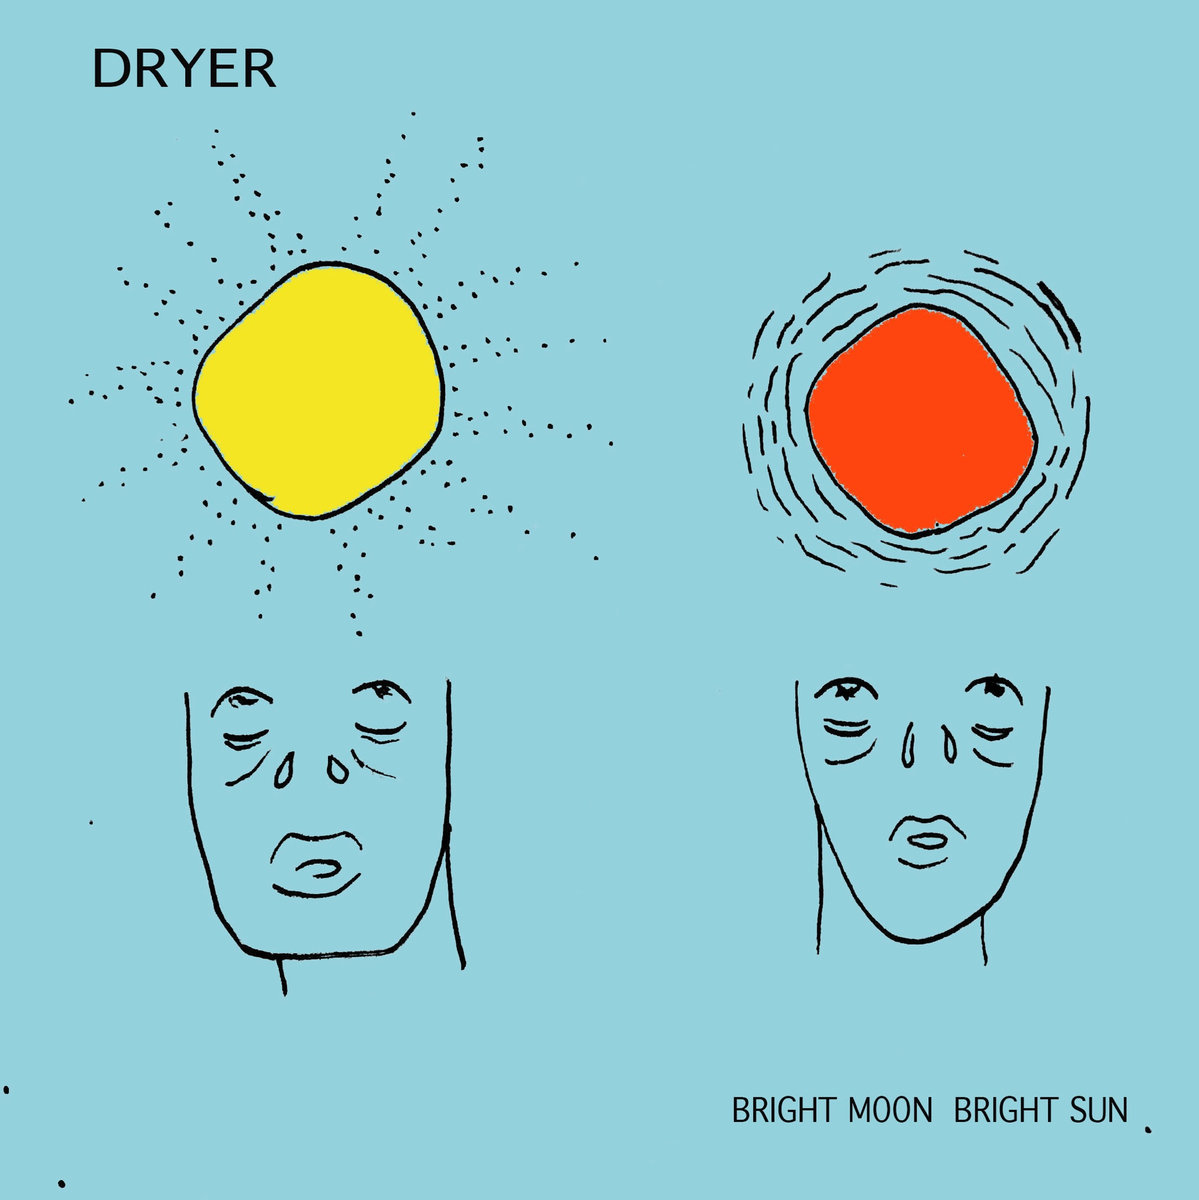 Dryer - Bright Moon Bright Sun